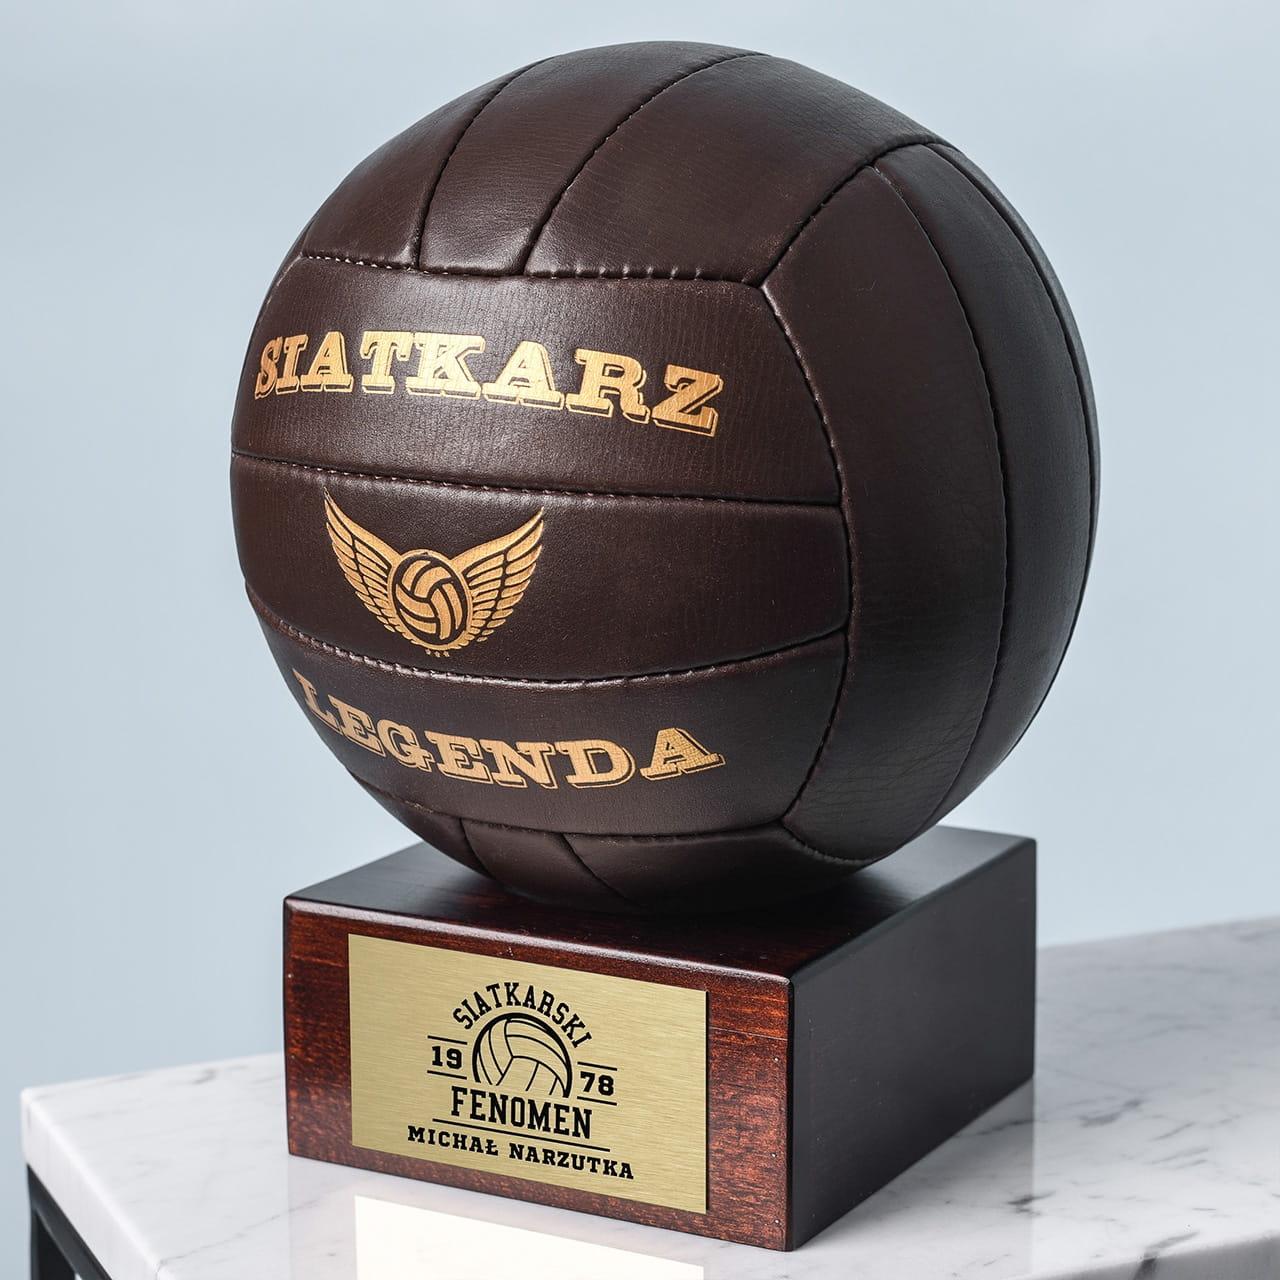 Skórzana piłka siatkarska retro SIATKARSKI FENOMEN